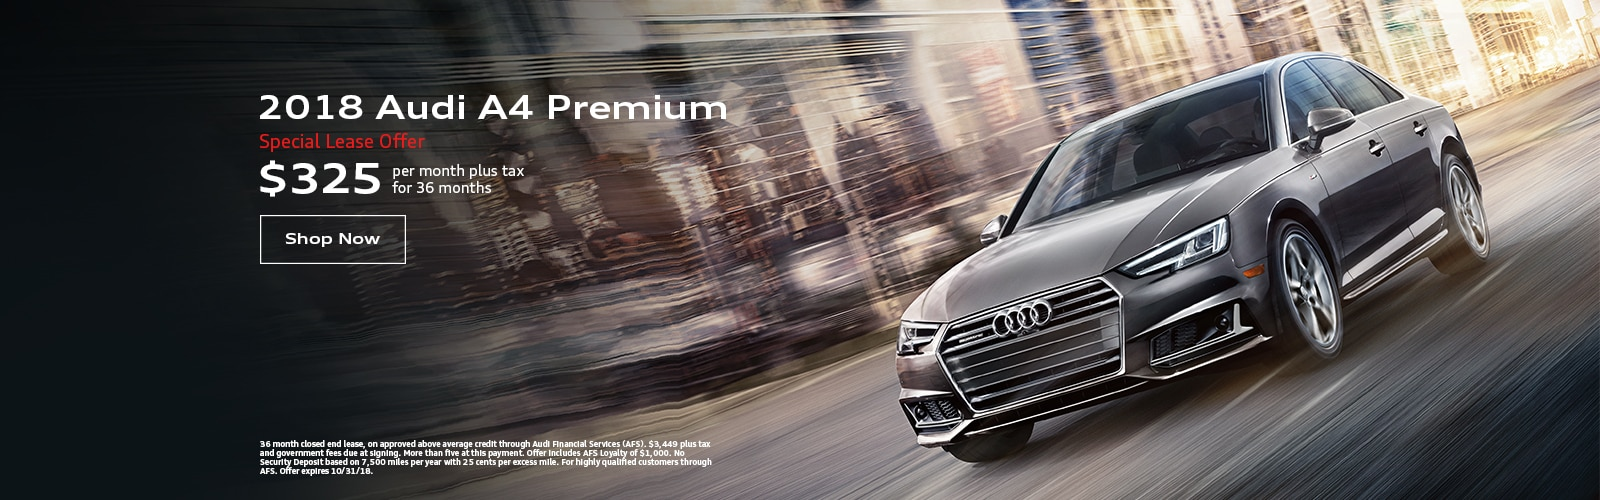 South Hills Audi Service Reviews Best Hills - South hills audi